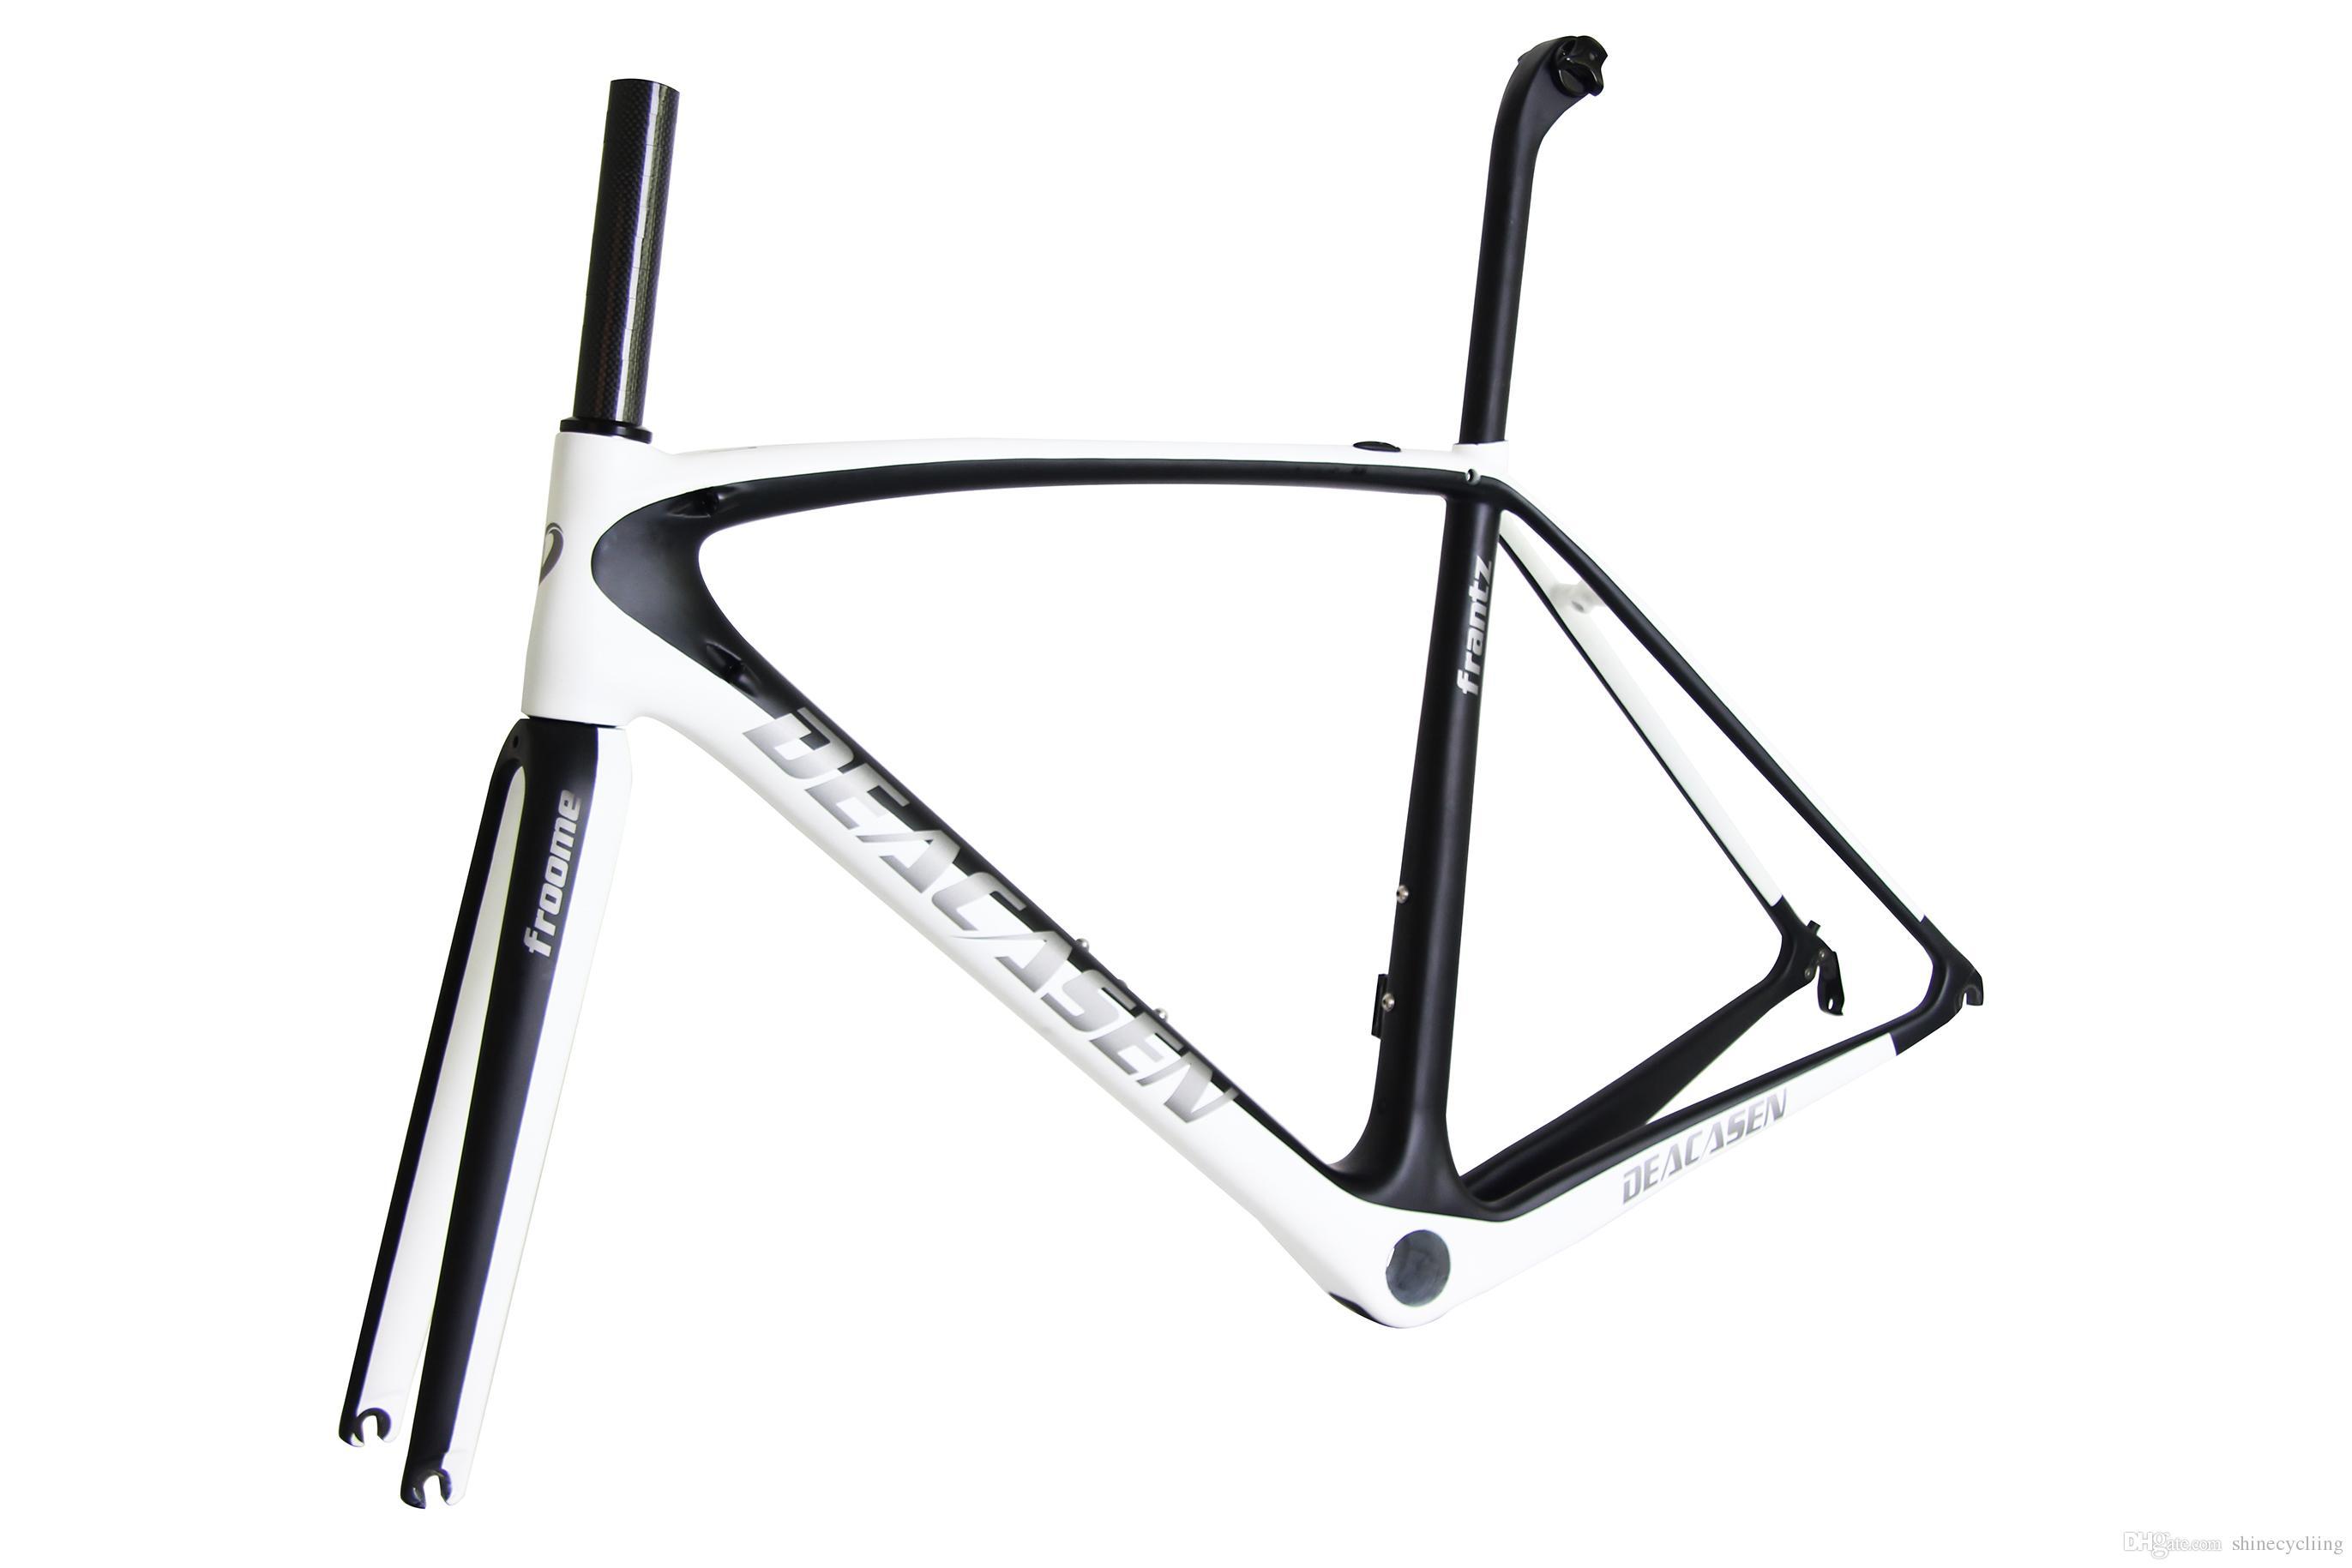 Super Light Cheap 2018 Carbon Fiber Bike Frame Frameset Aero Carbon ...